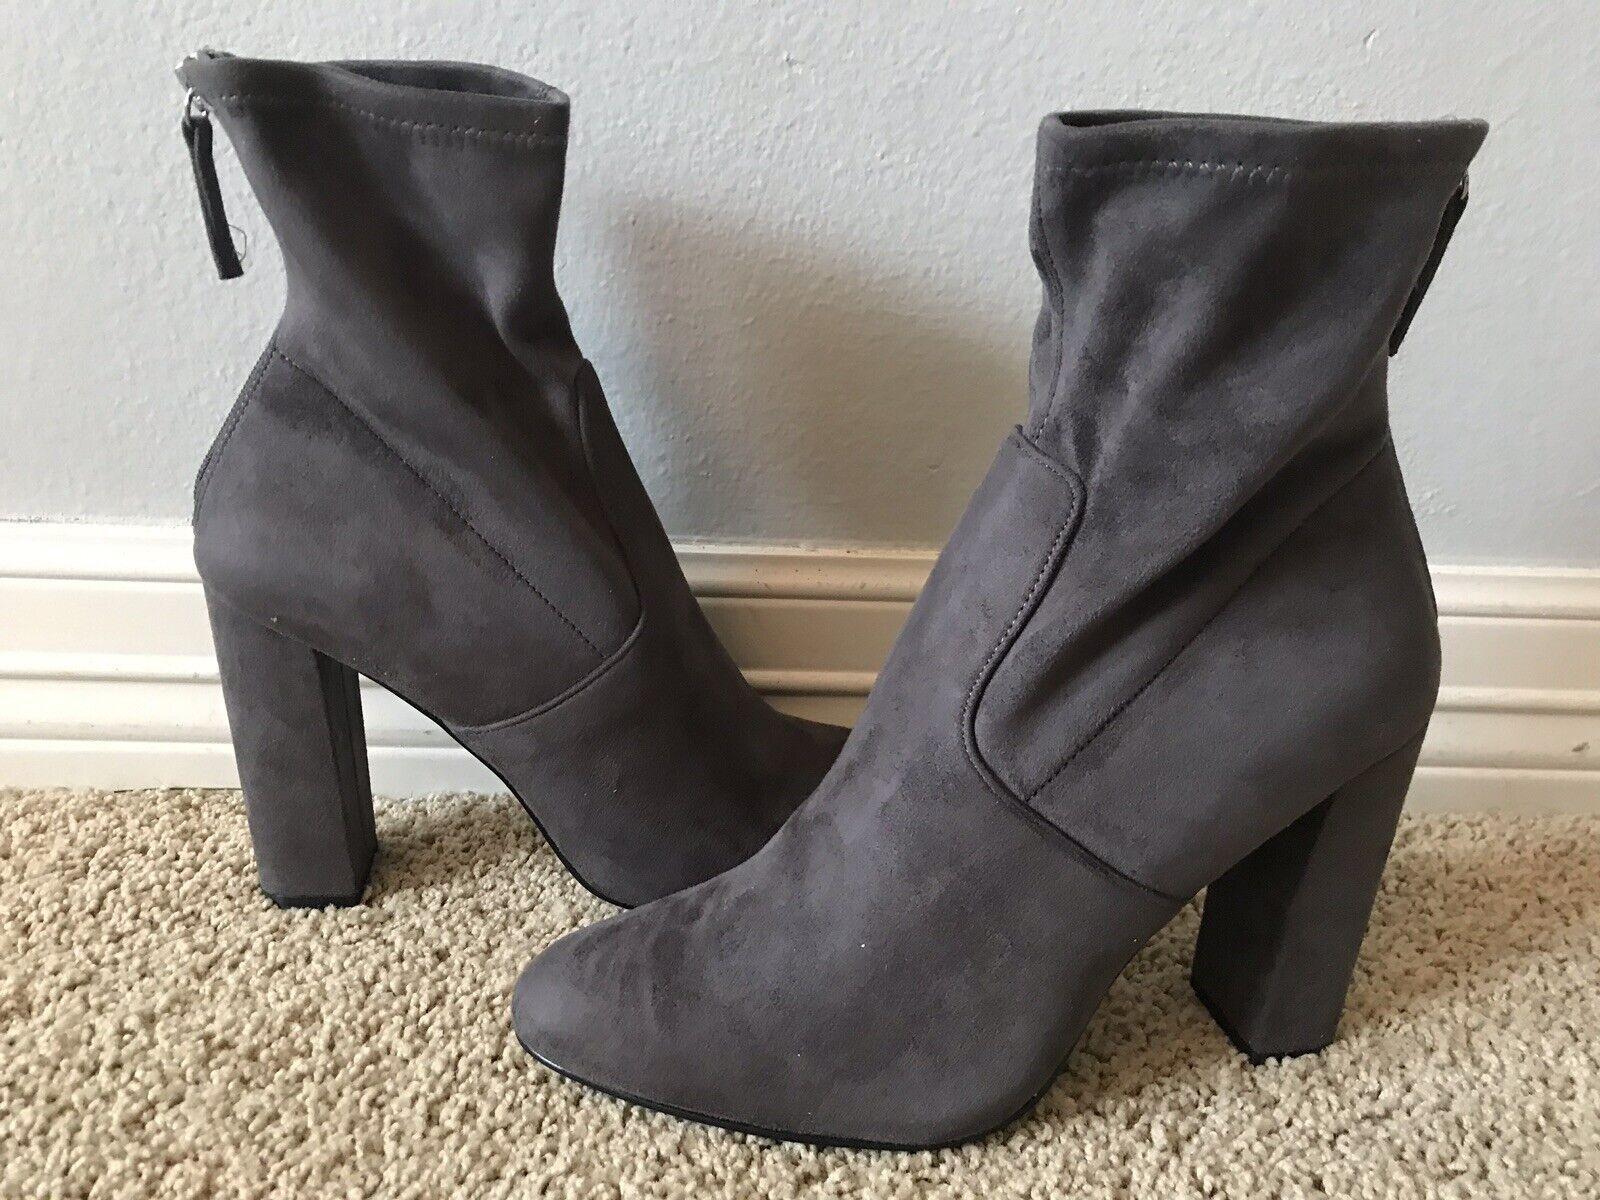 New STEVE MADDEN Women's Brisk Grey Micro Suede Boots Sz 10